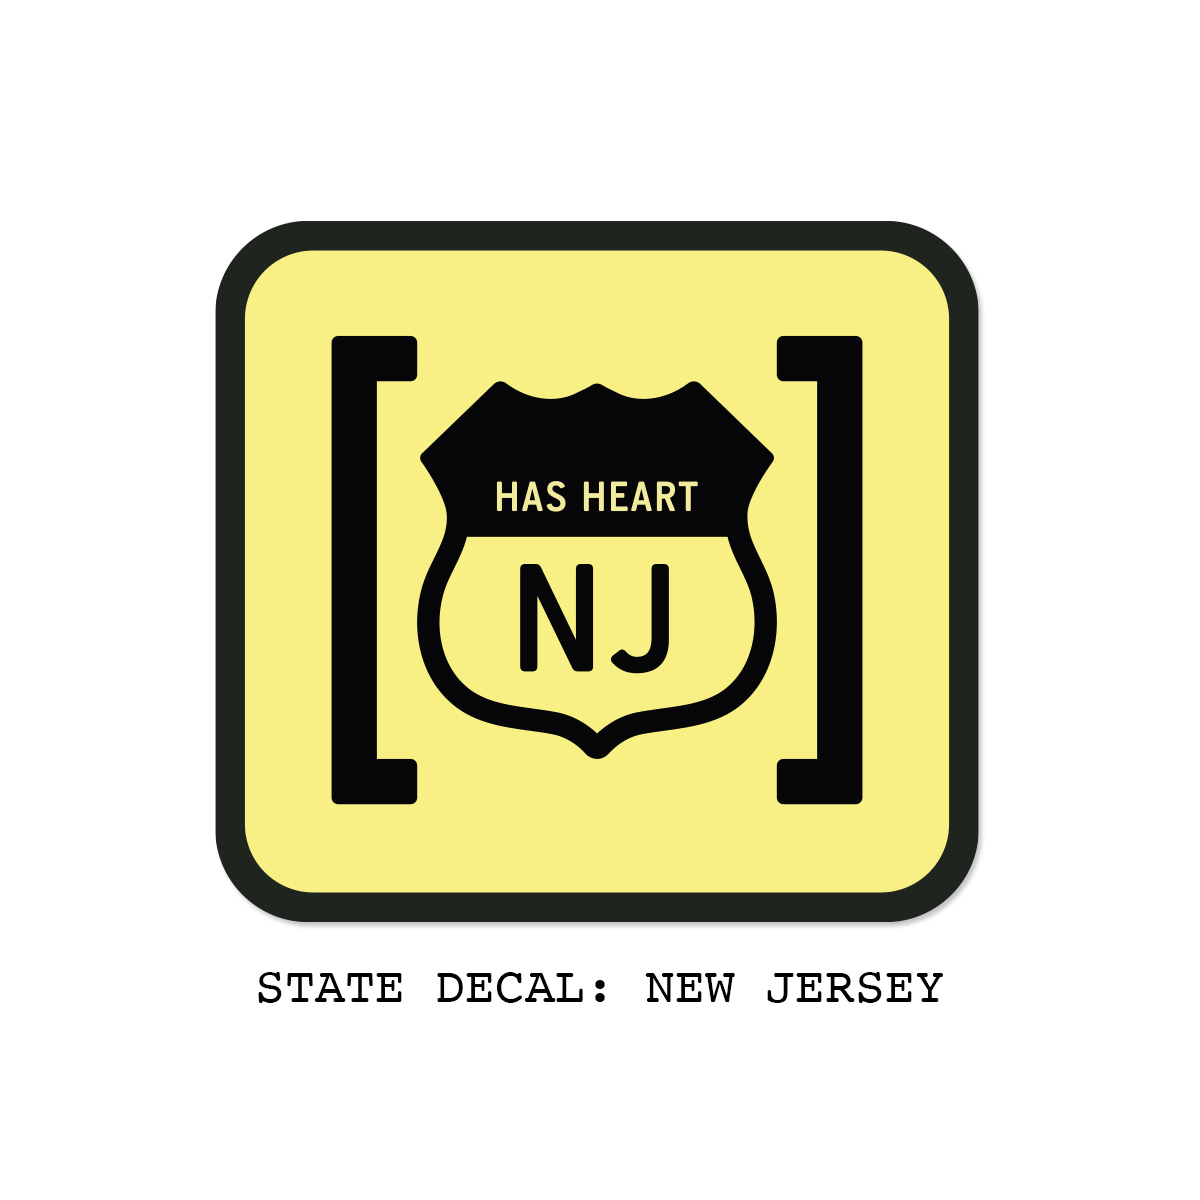 hasheart-statedecal-NJ